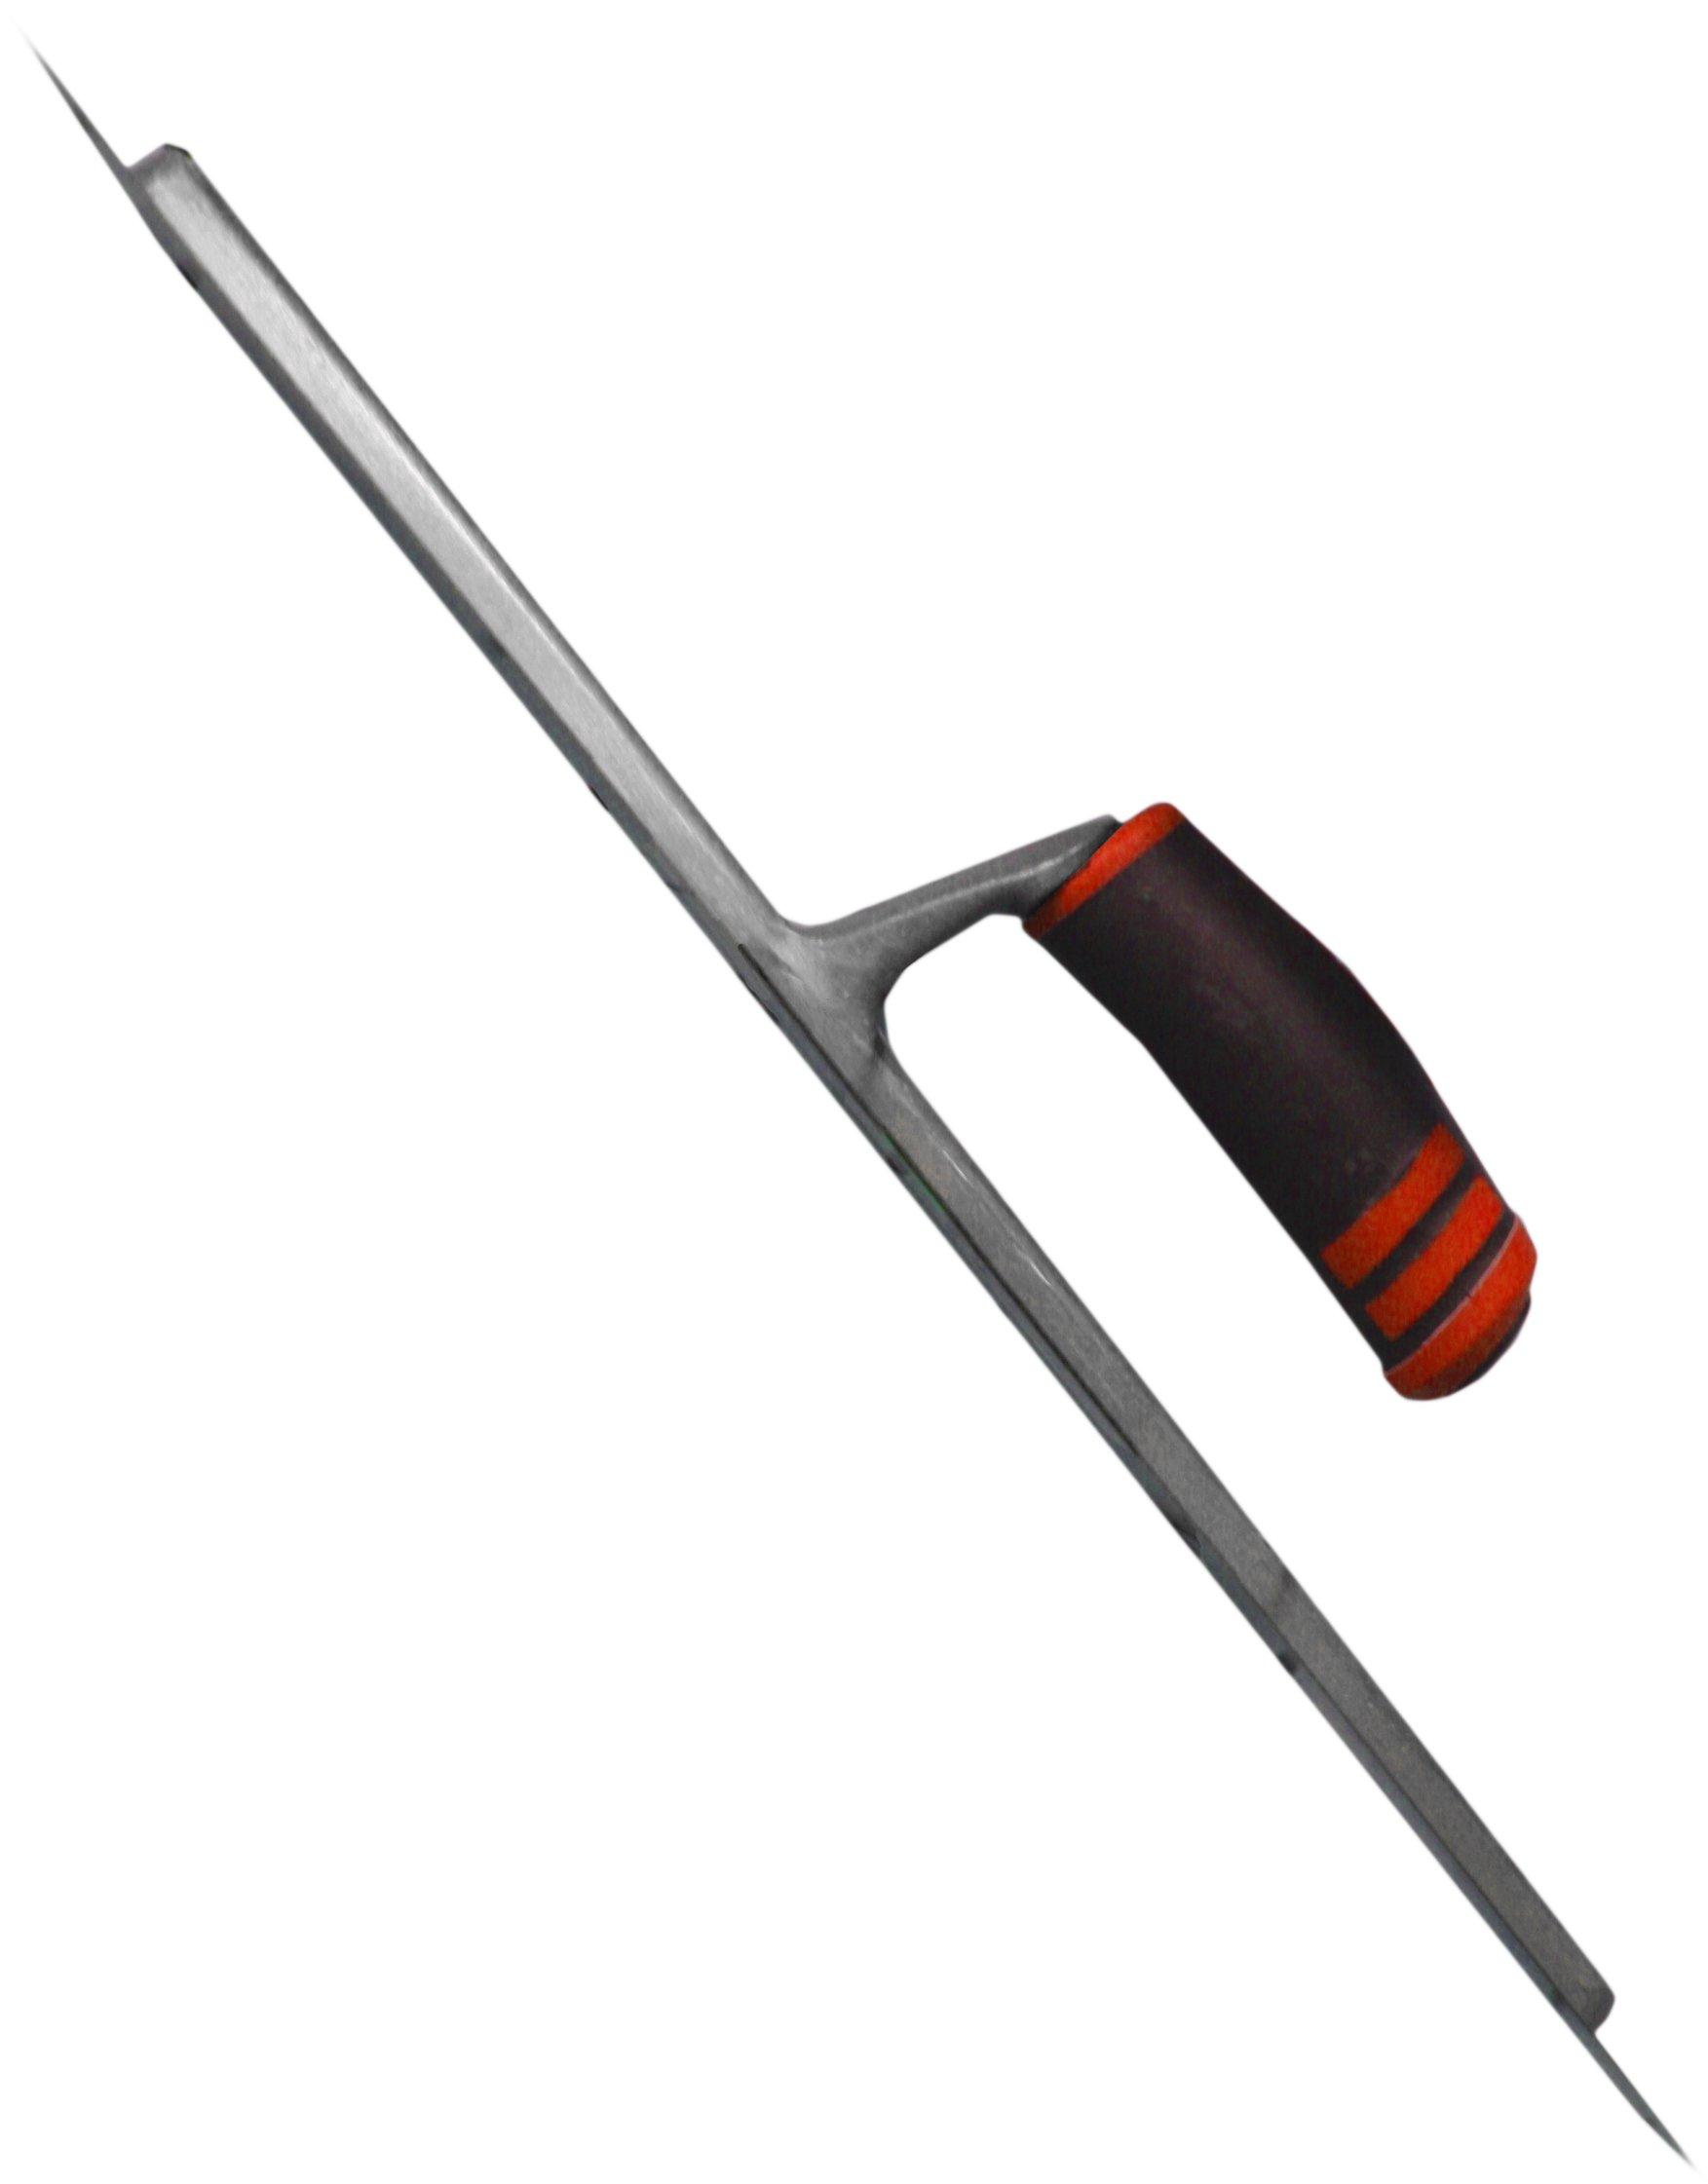 Task Tools T33937 Pro Finishing Trowel